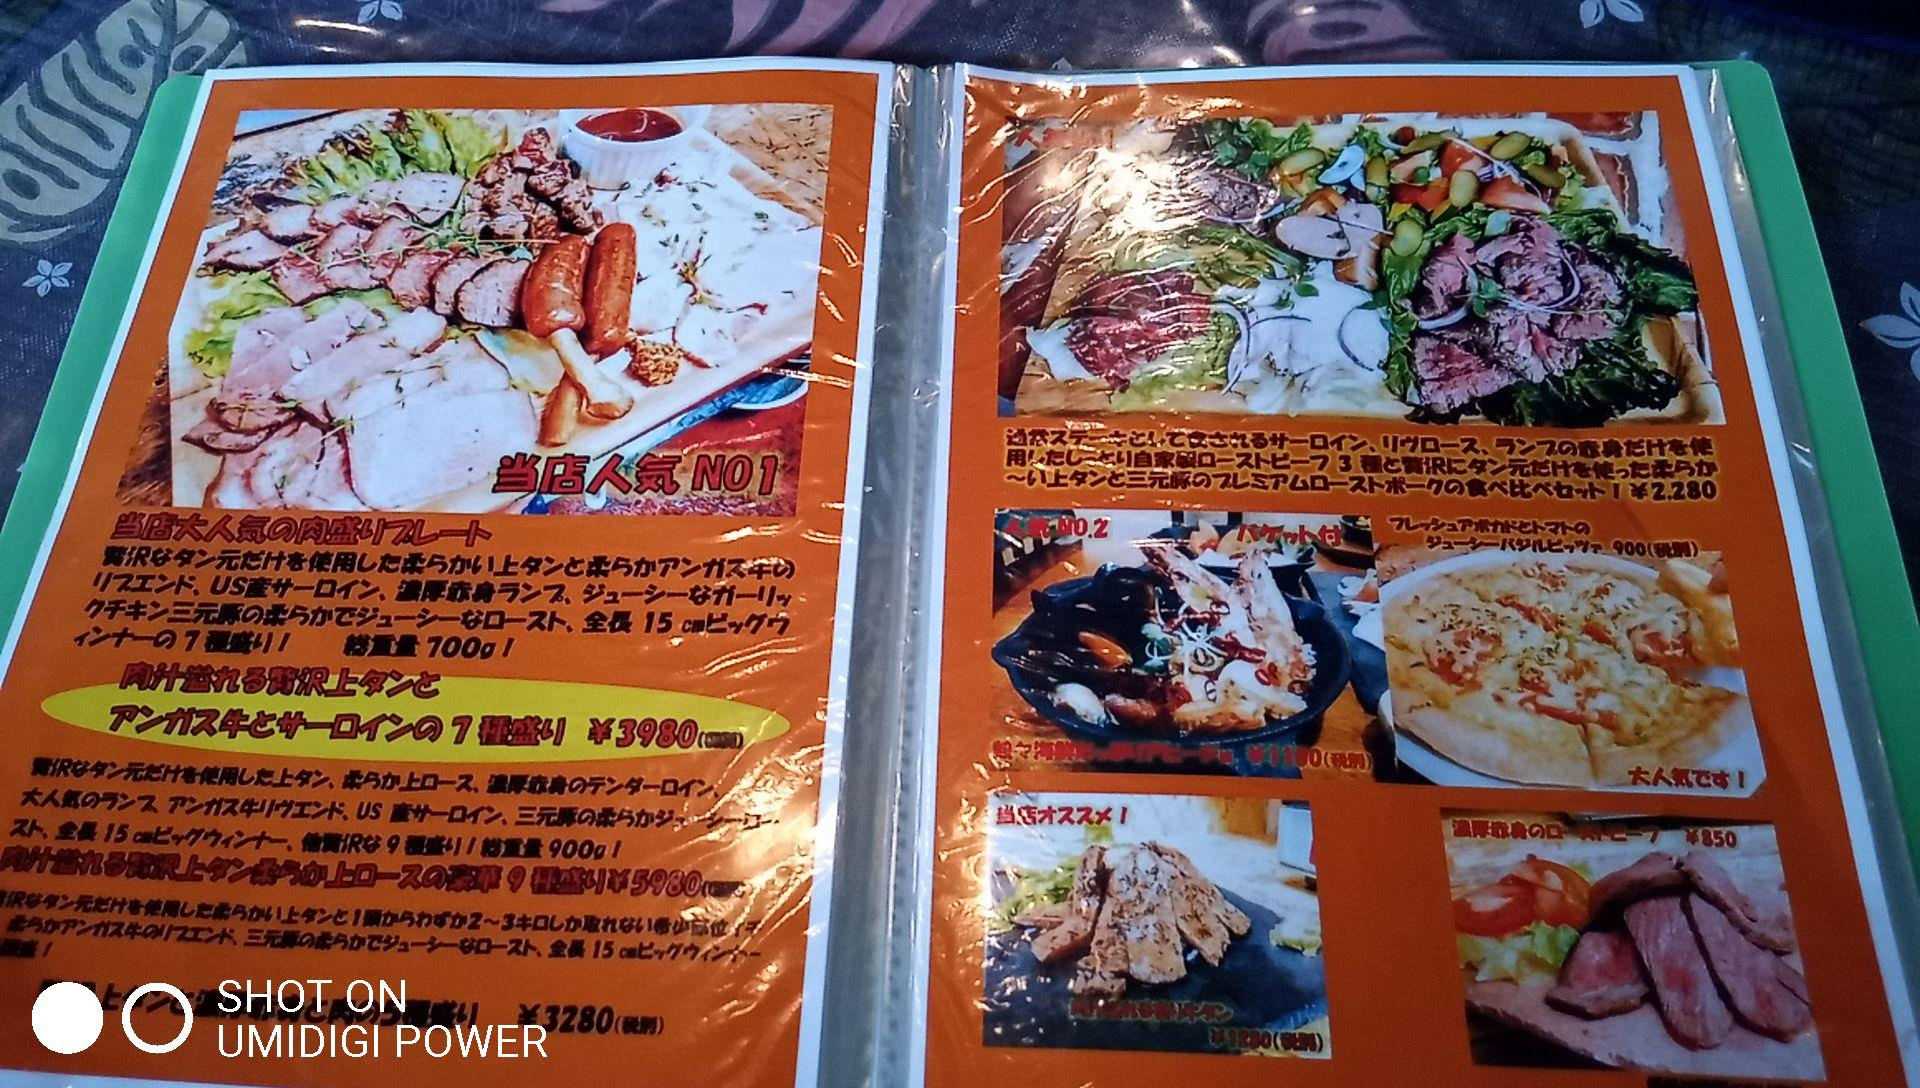 the menu of Meat Bar Hikiy's 5